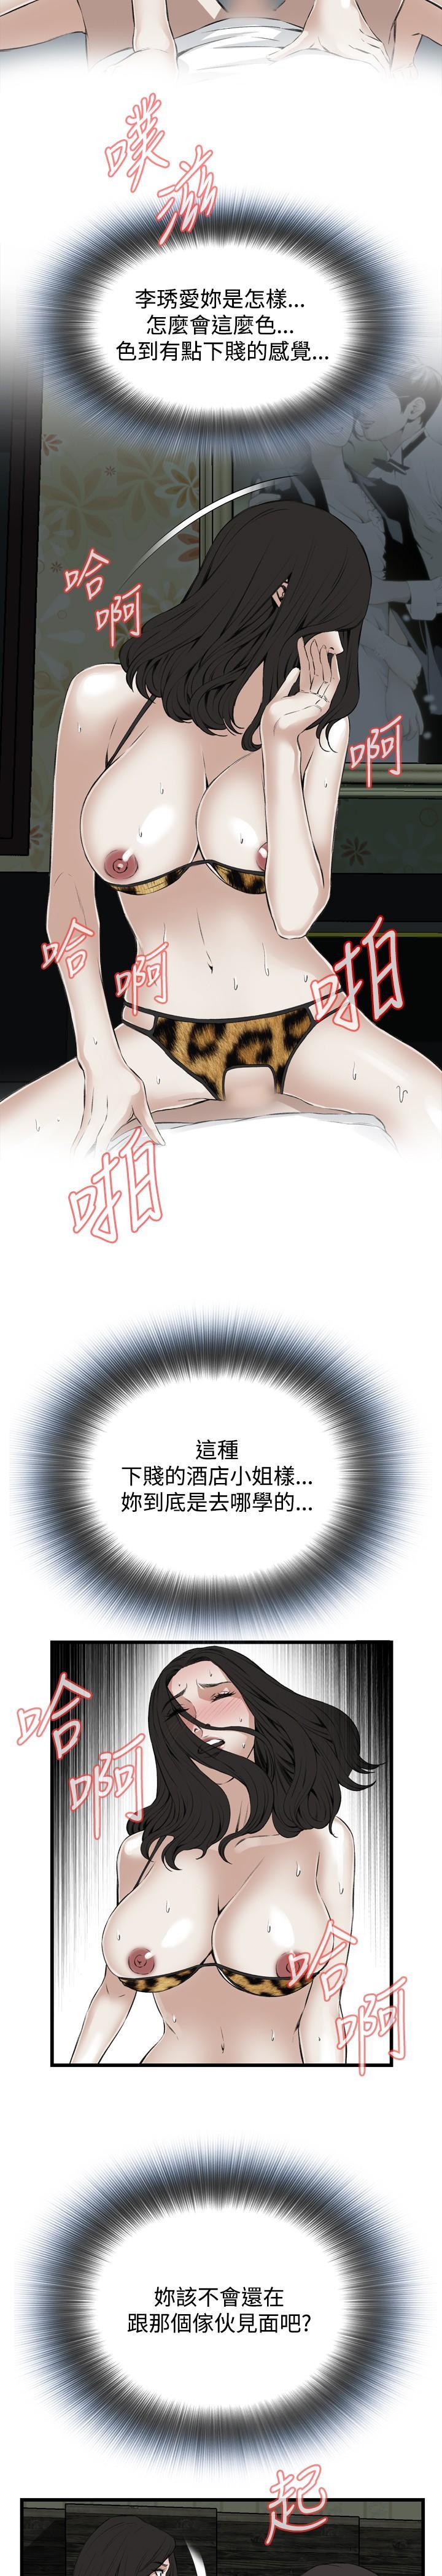 Take a Peek 偷窥 Ch.39~55 [Chinese]中文 473